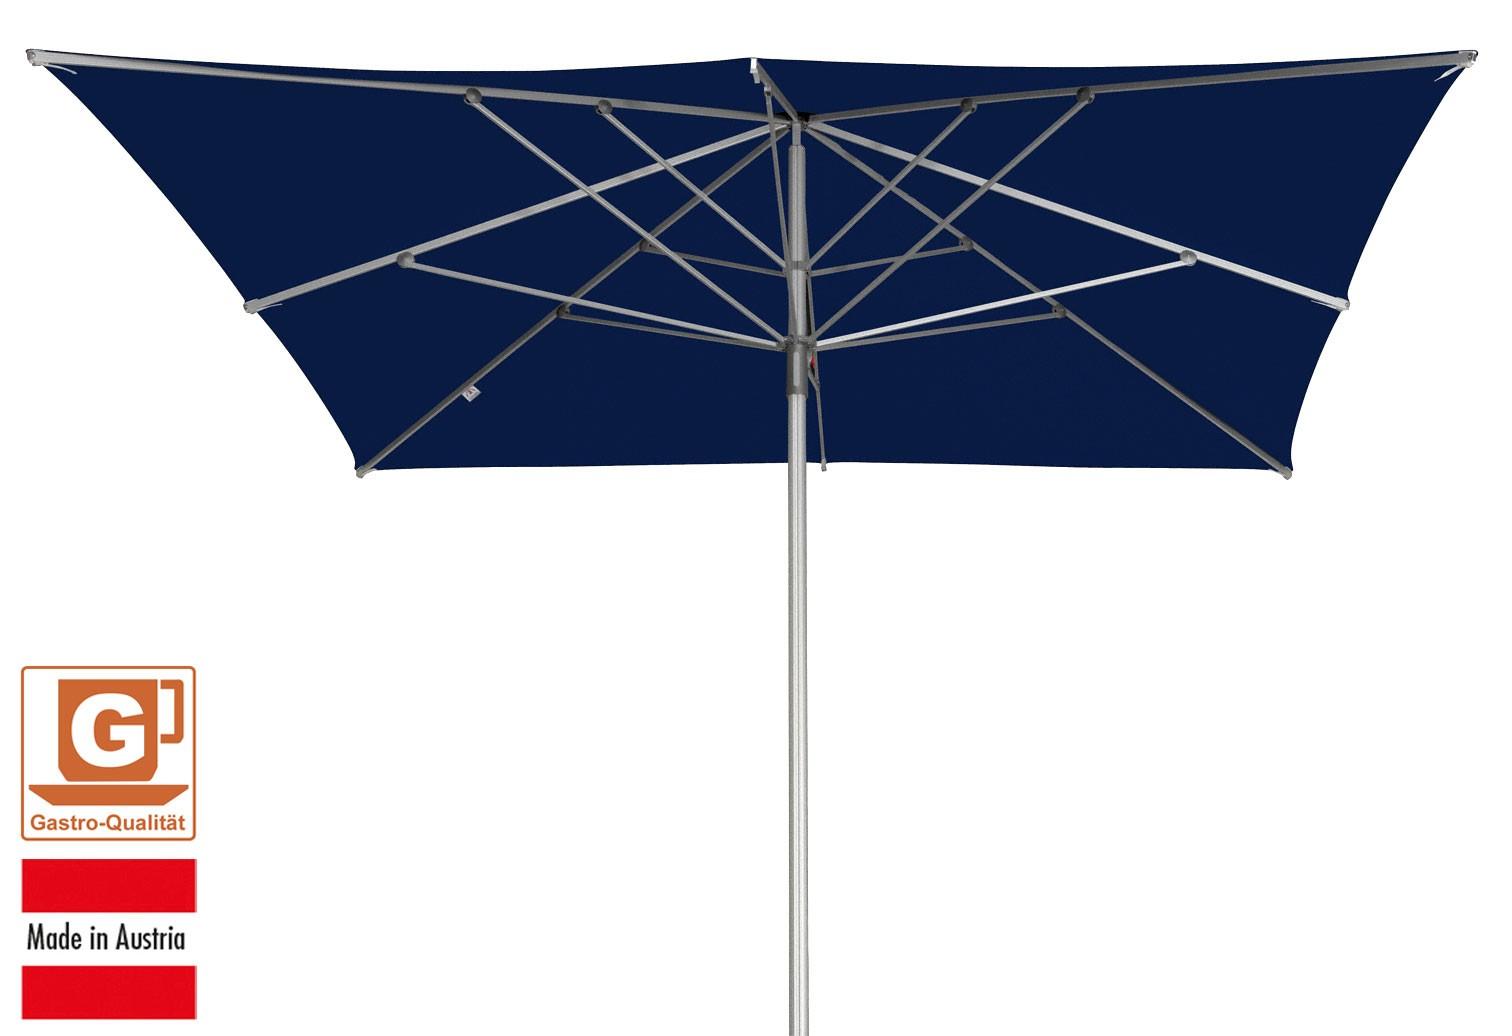 gro schirm sonnenschirm doppler alu expert 350x350cm dunkelblau bei. Black Bedroom Furniture Sets. Home Design Ideas